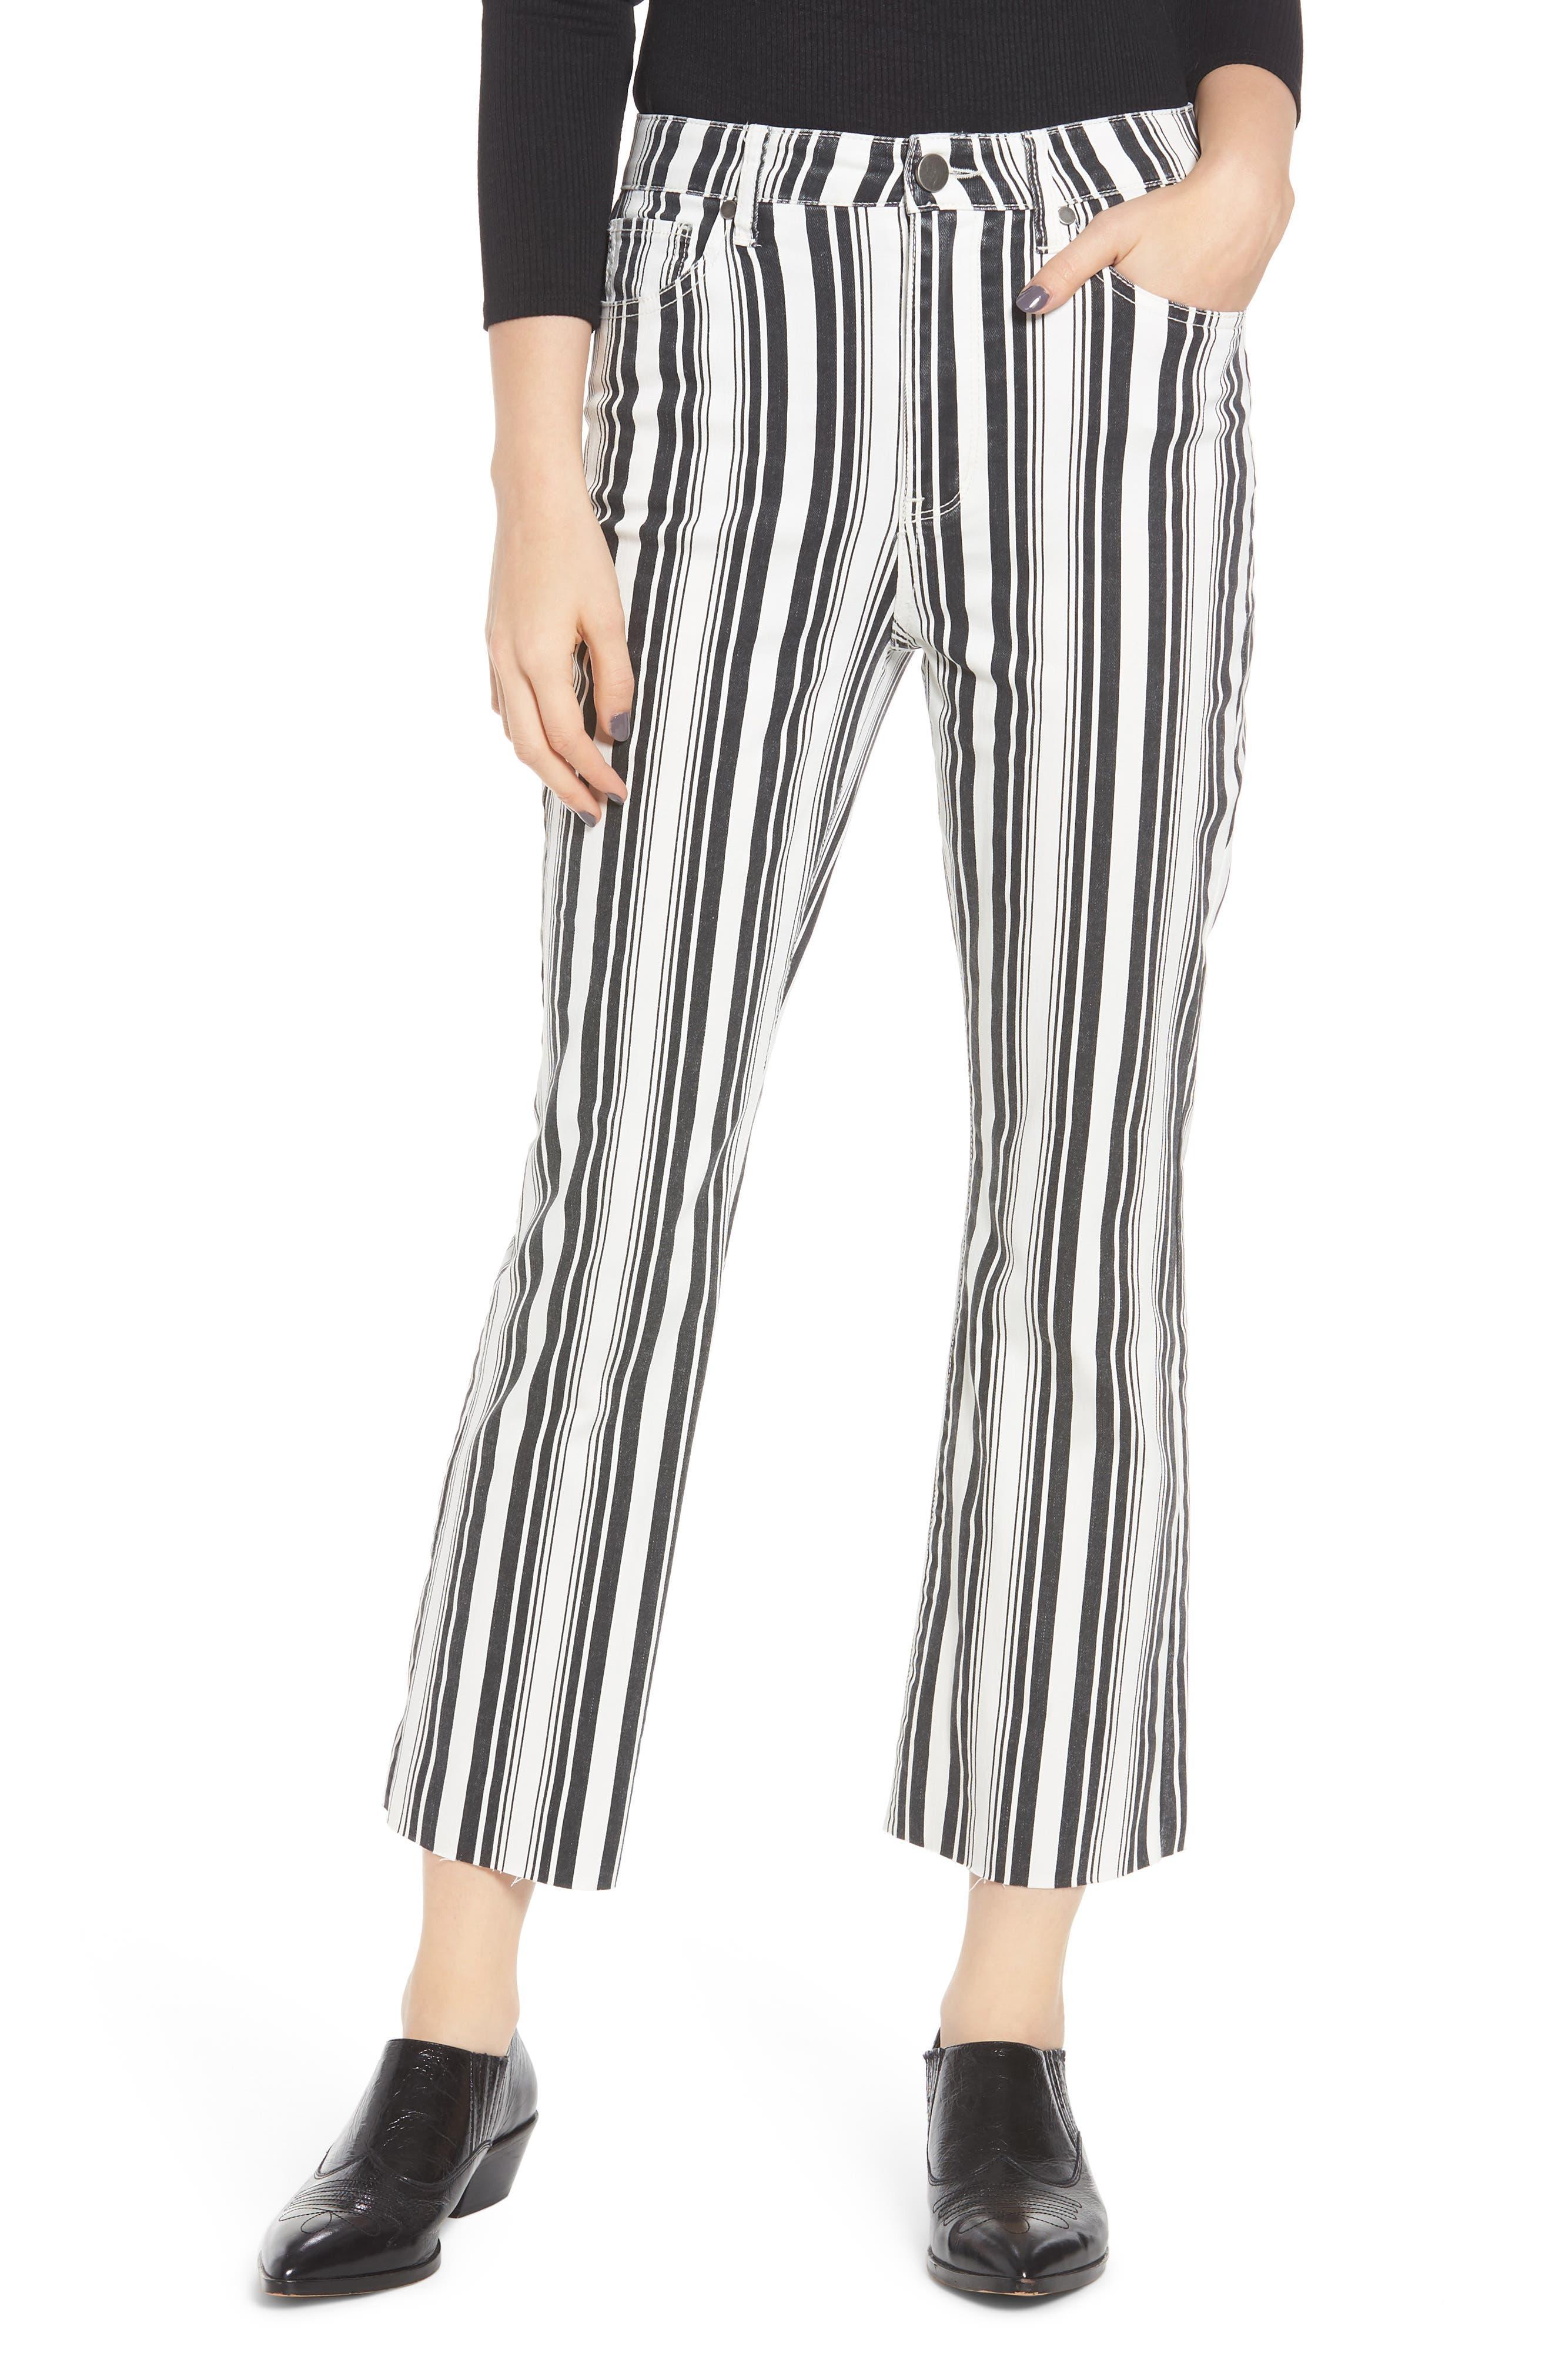 TINSEL, Stripe Crop Flare Jeans, Main thumbnail 1, color, WHITE BLACK